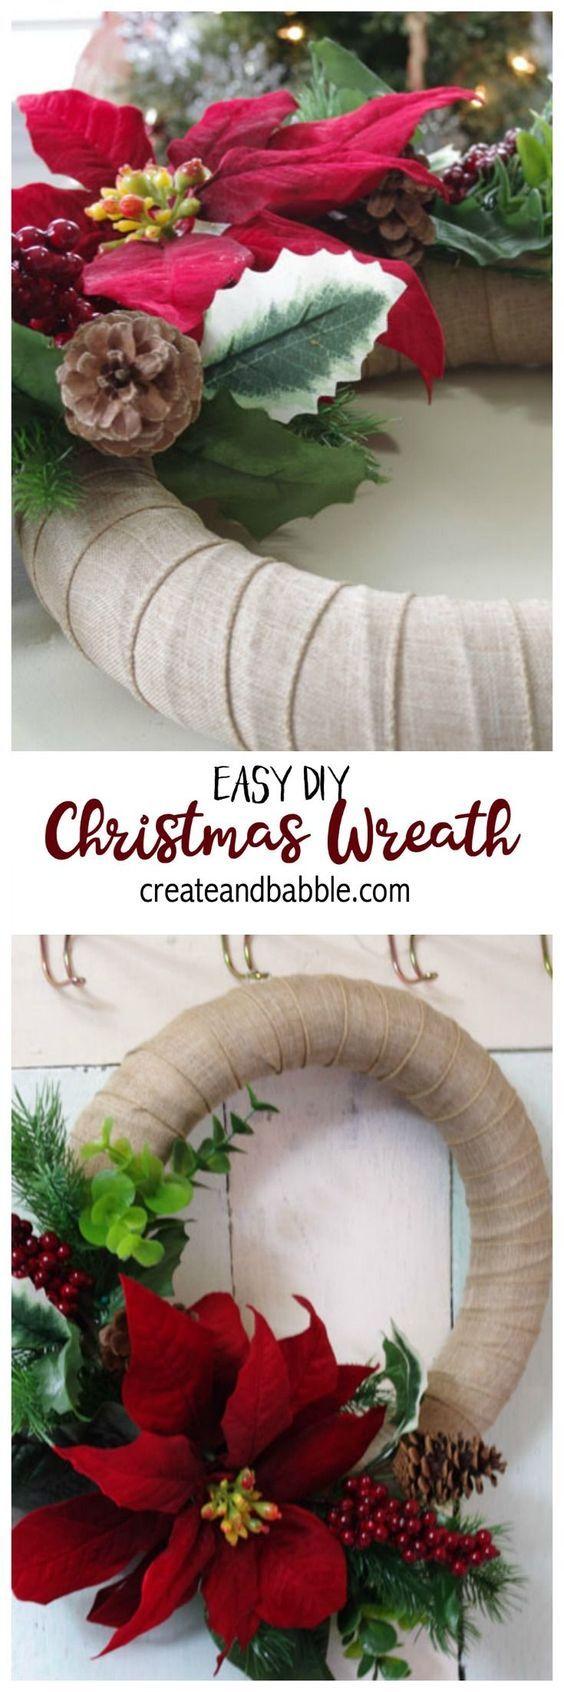 Easy Christmas Wreath To Make - Create And Babble